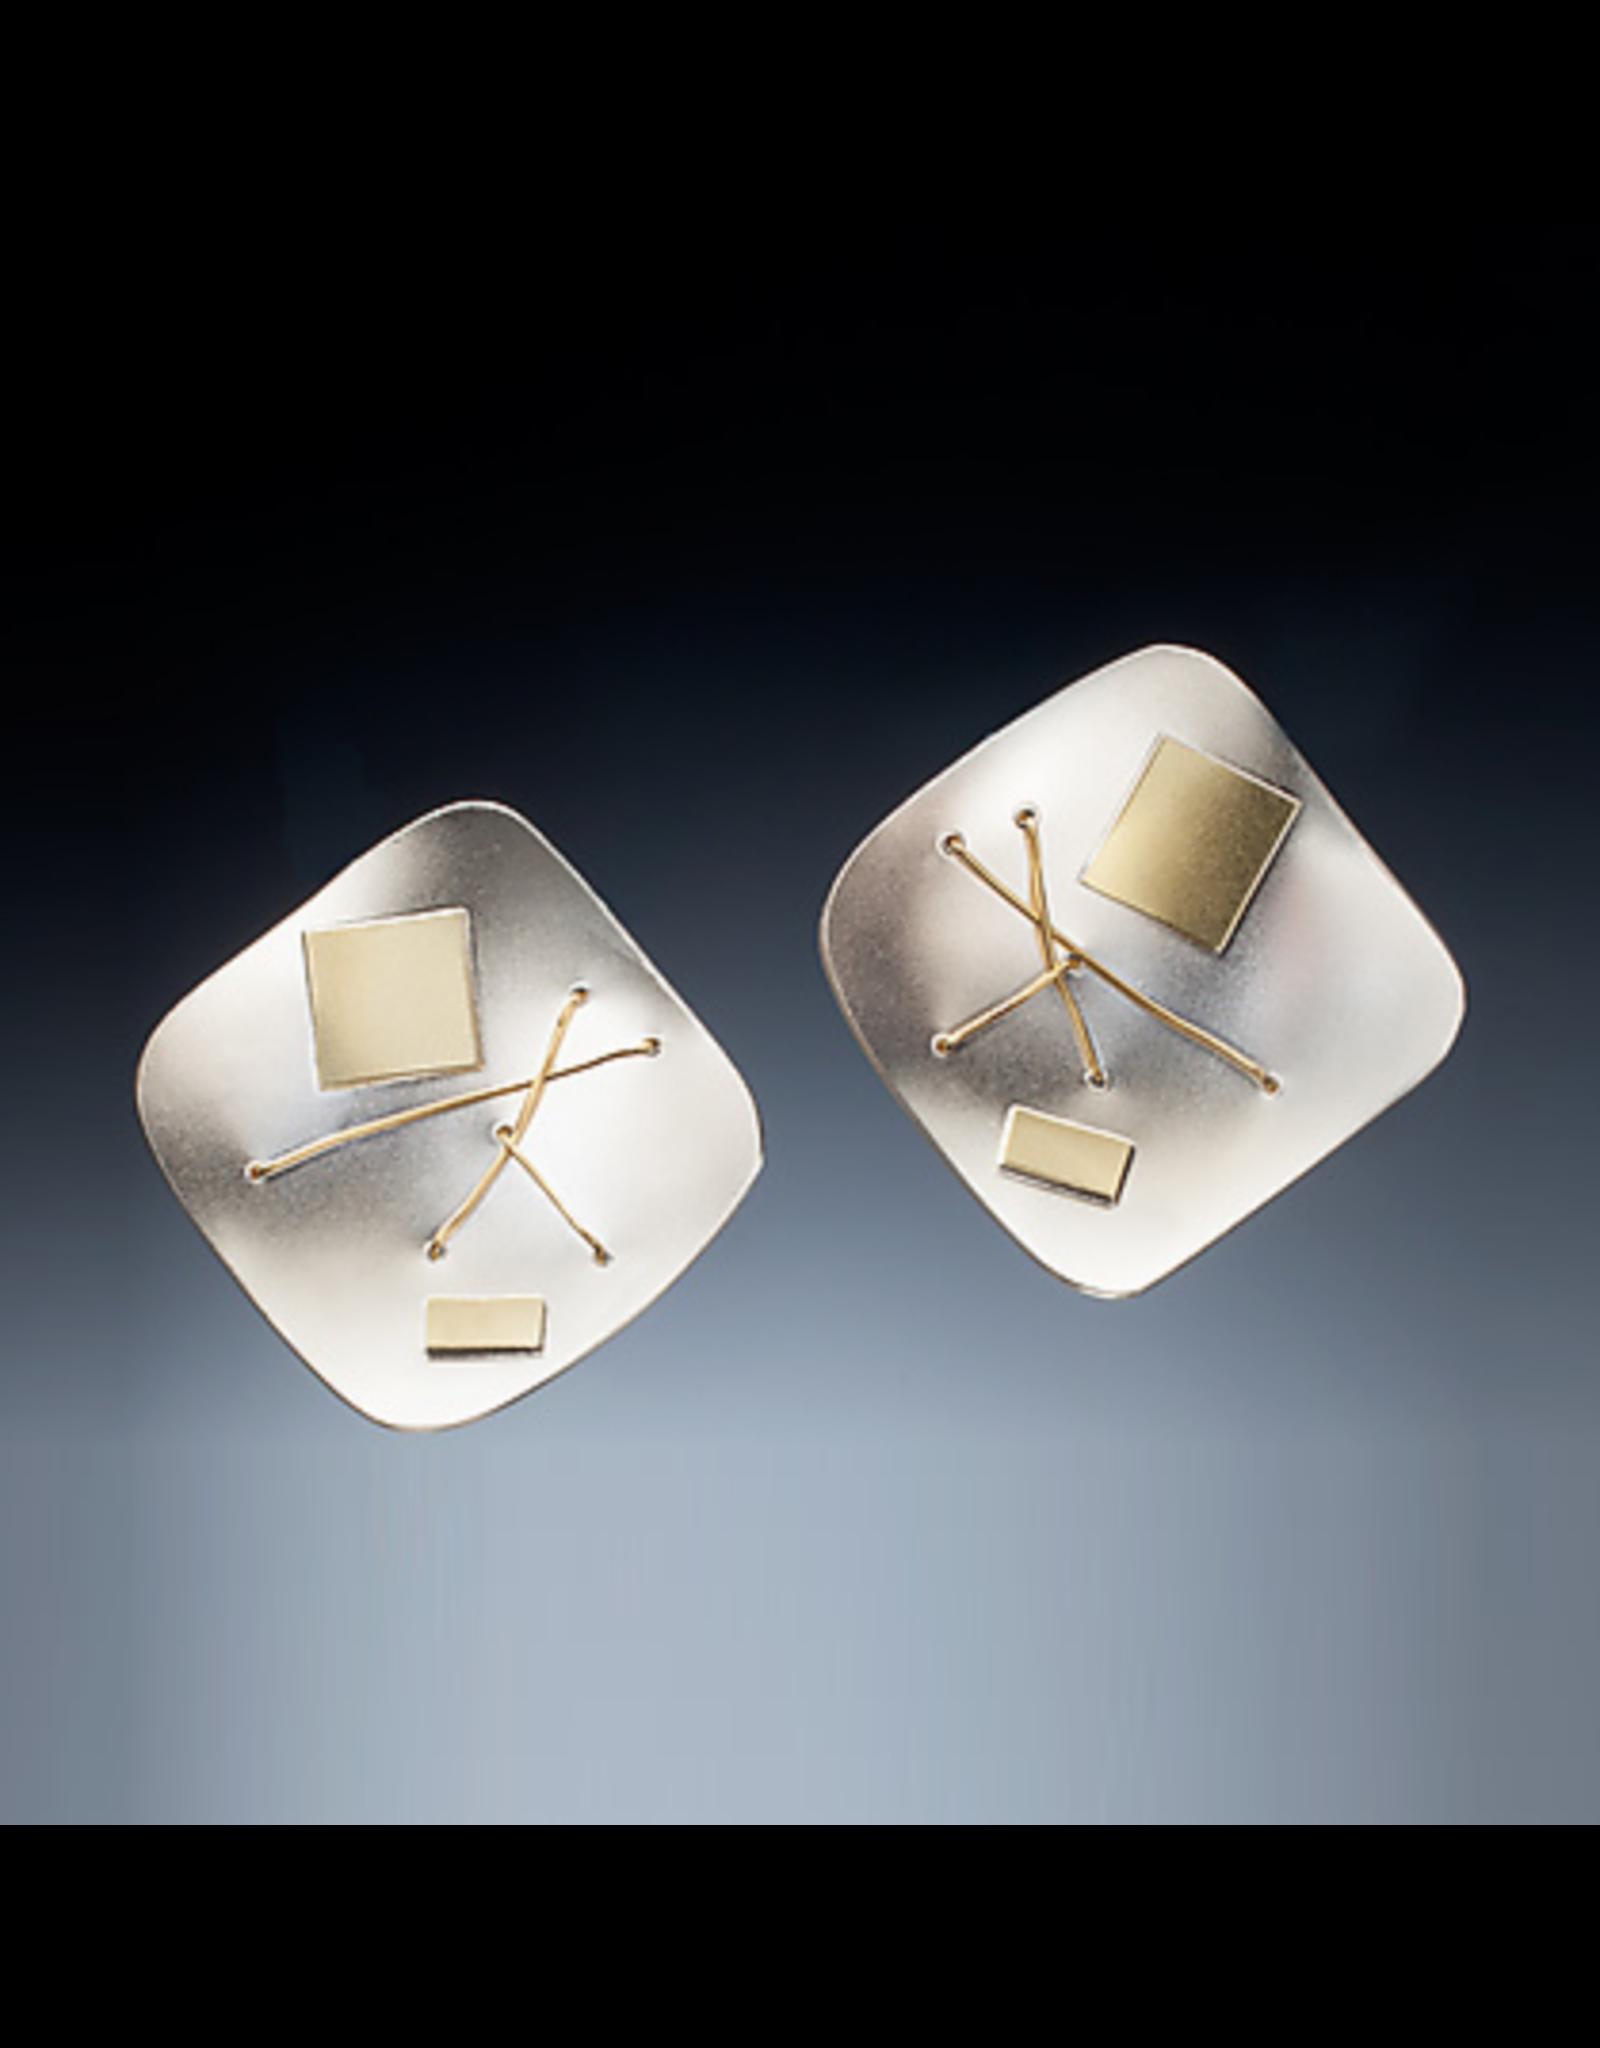 Suzanne Schwartz Jewelry Suzanne Schwartz Interwoven Square Earrings